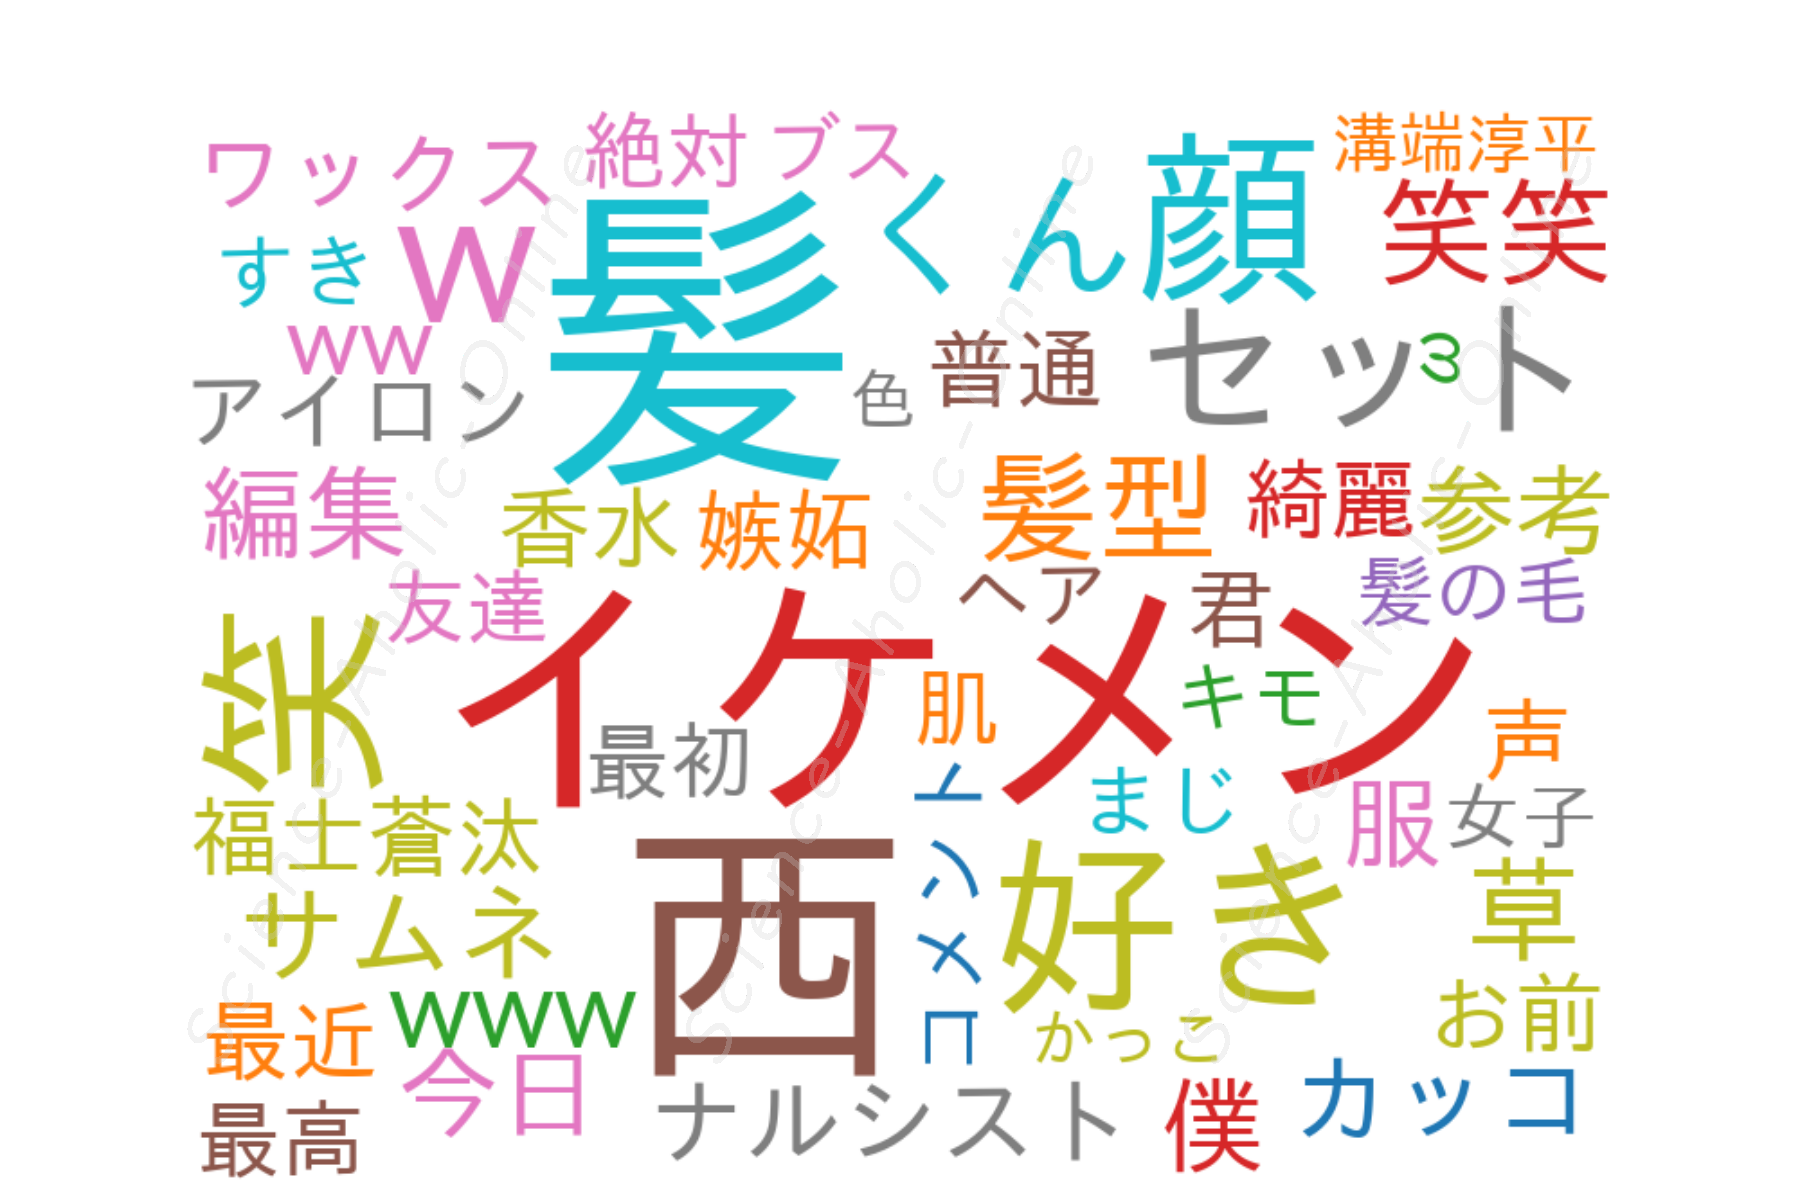 https://science-aholic-online.com/wp-content/uploads/2020/08/wordcloud_髪西.png